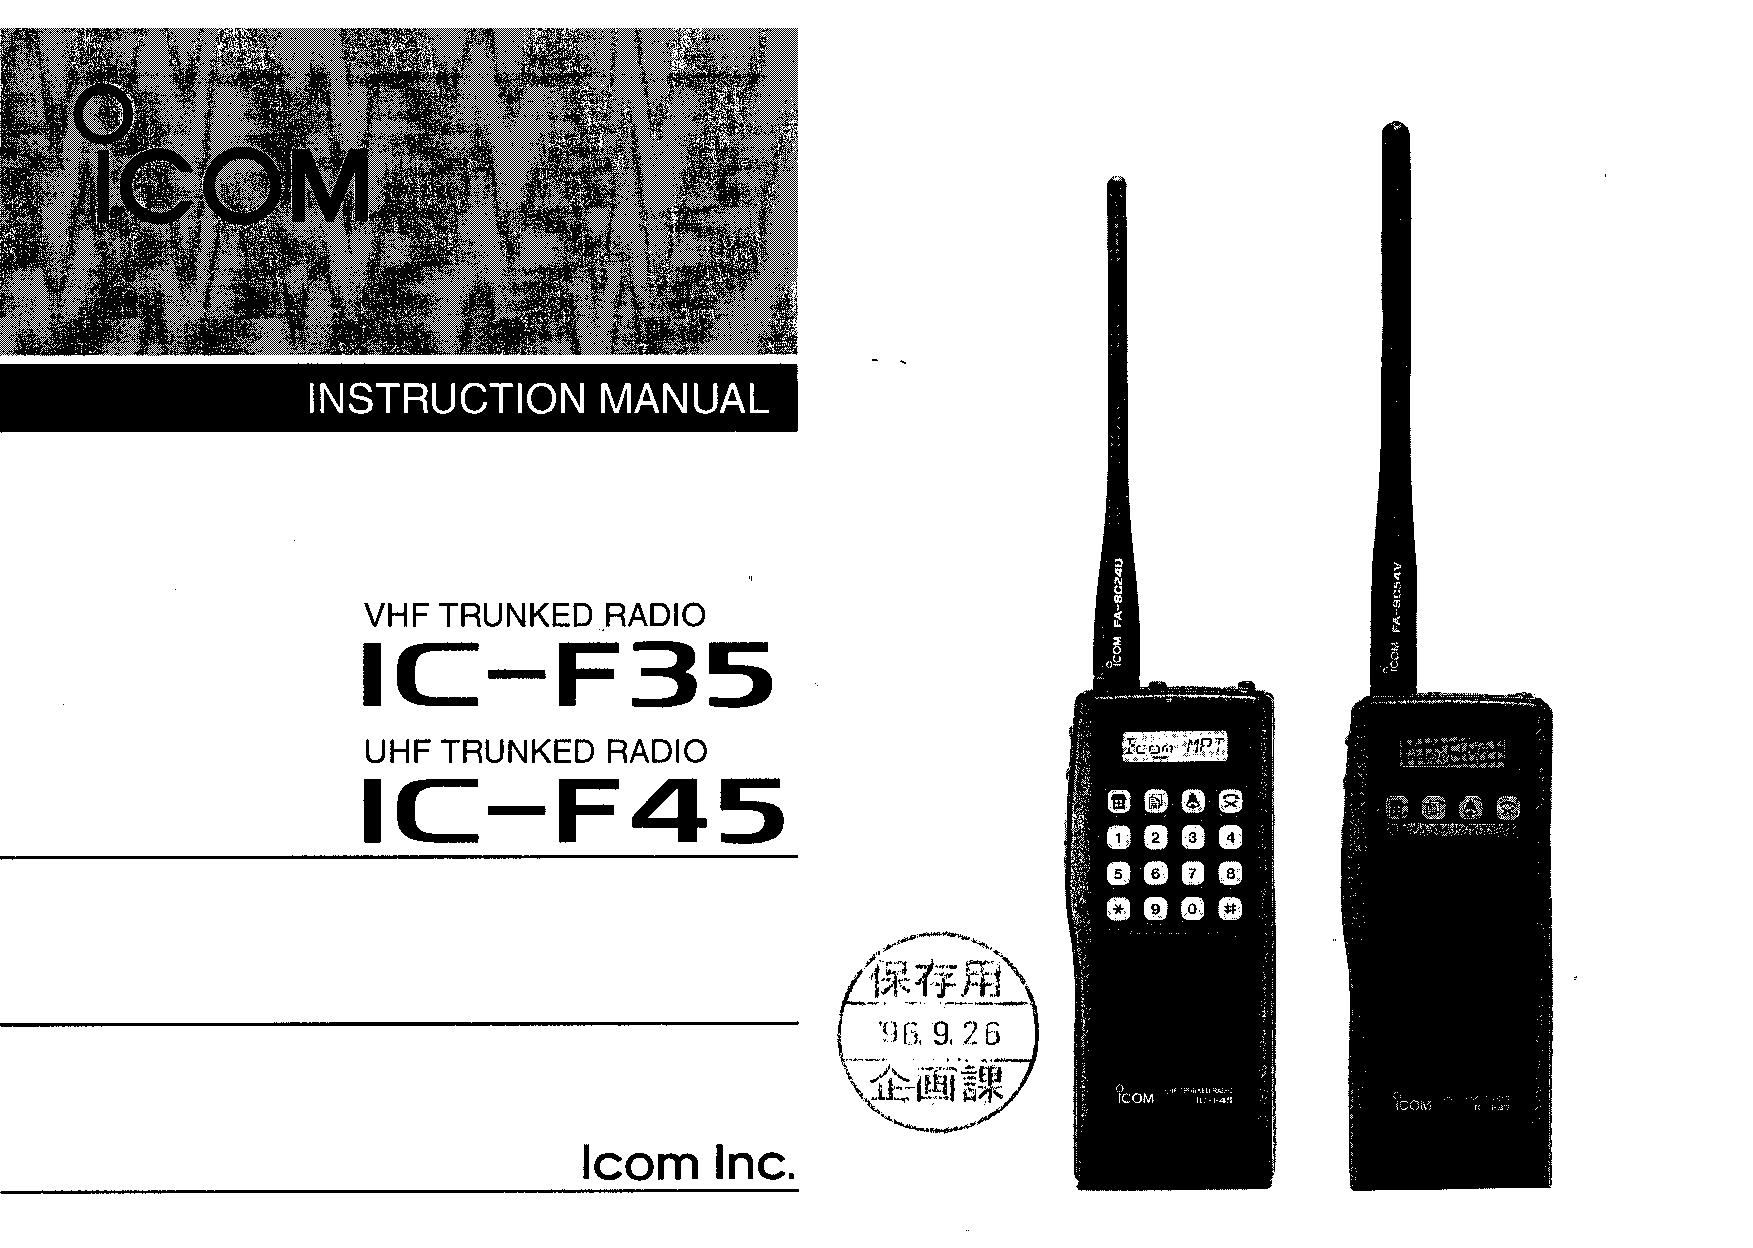 Icom IC-F35, IC-F45 User Manual